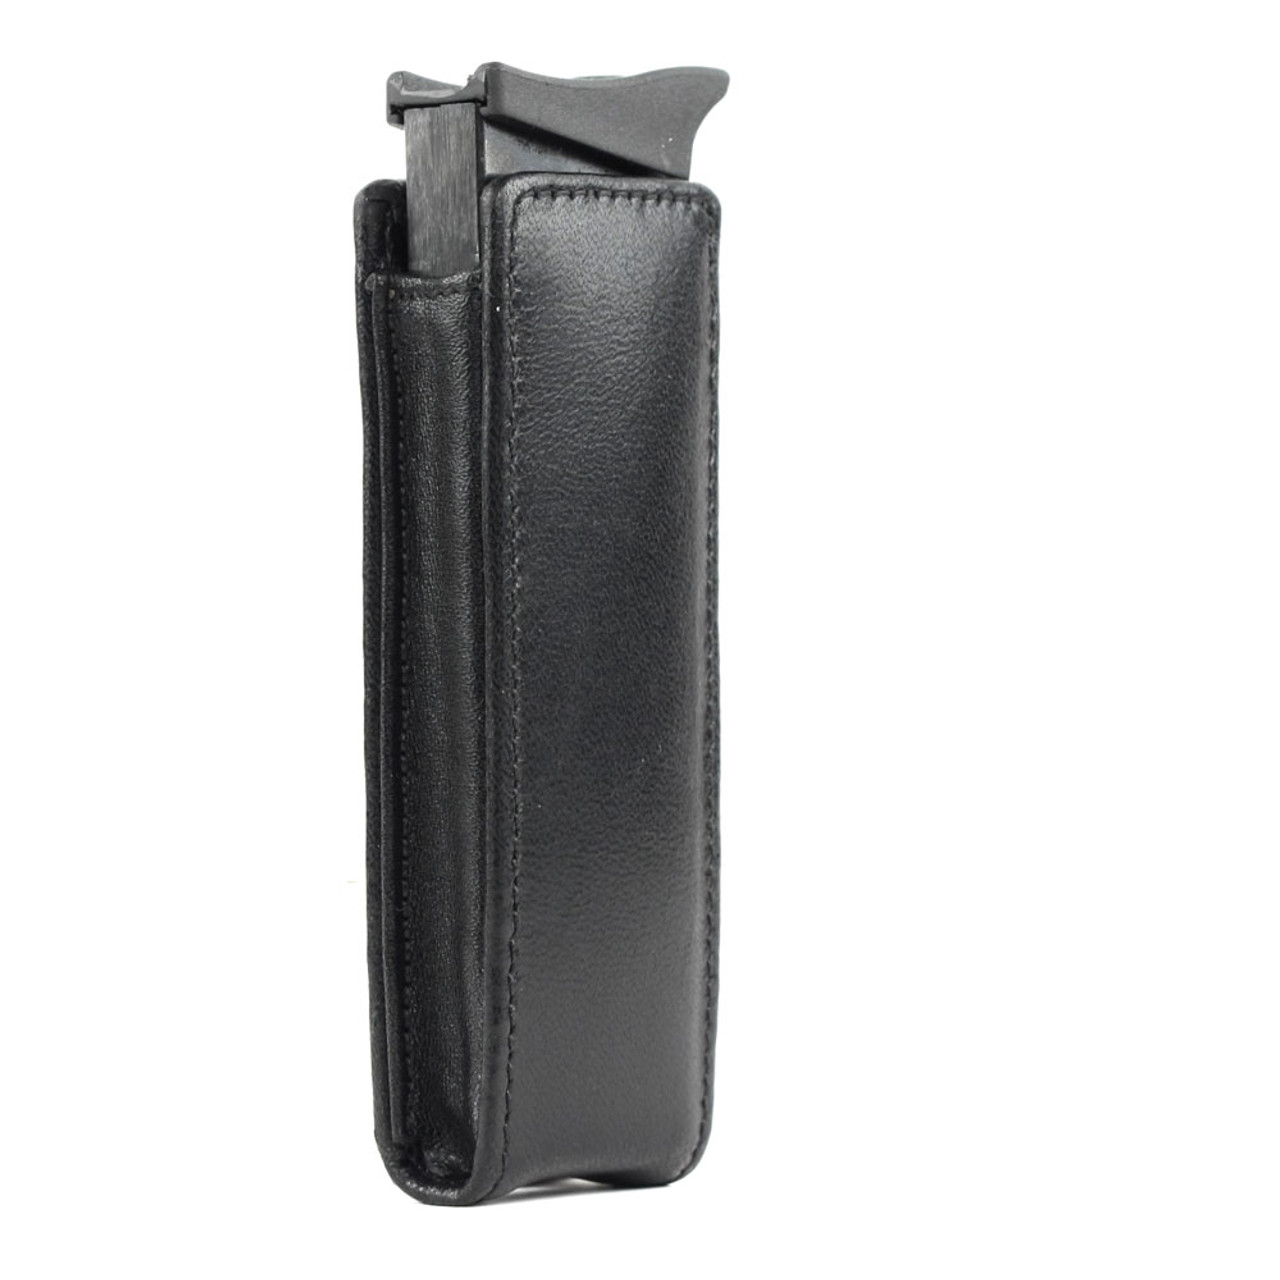 Bersa Thunder 380 CC Magazine Pocket Protector